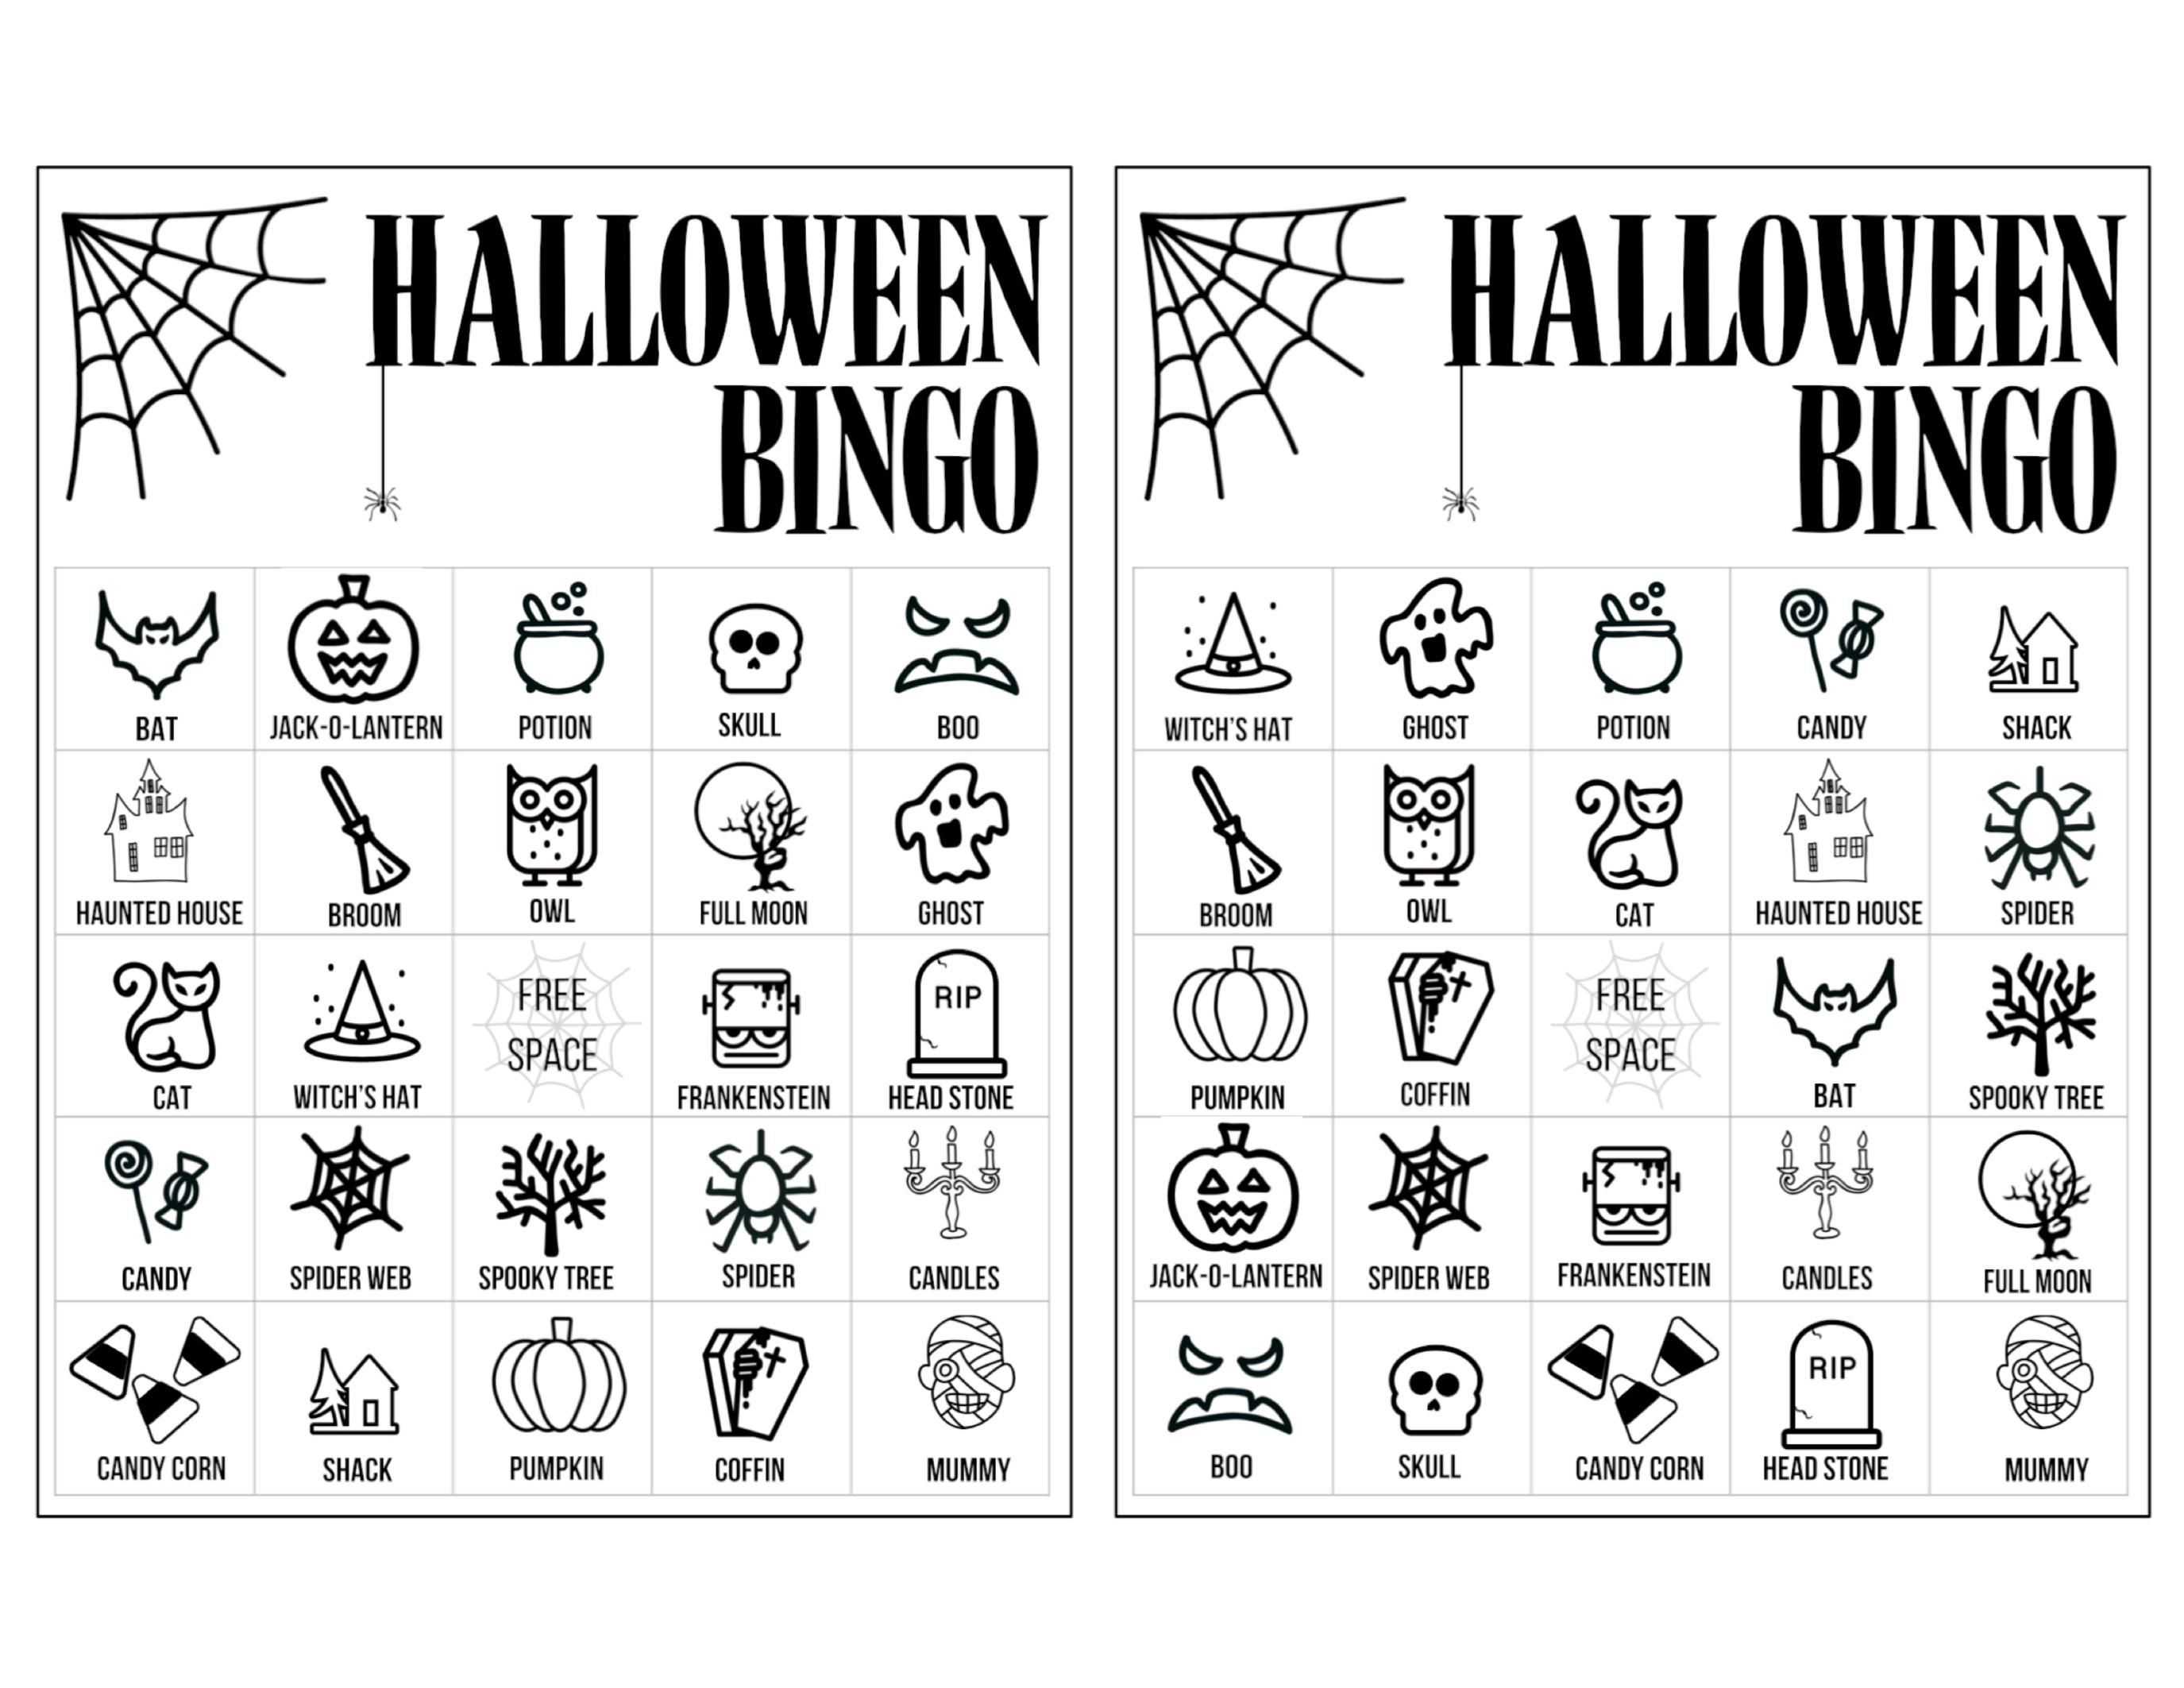 easy halloween activity halloween bingo printable game cards template fun kids halloween party game